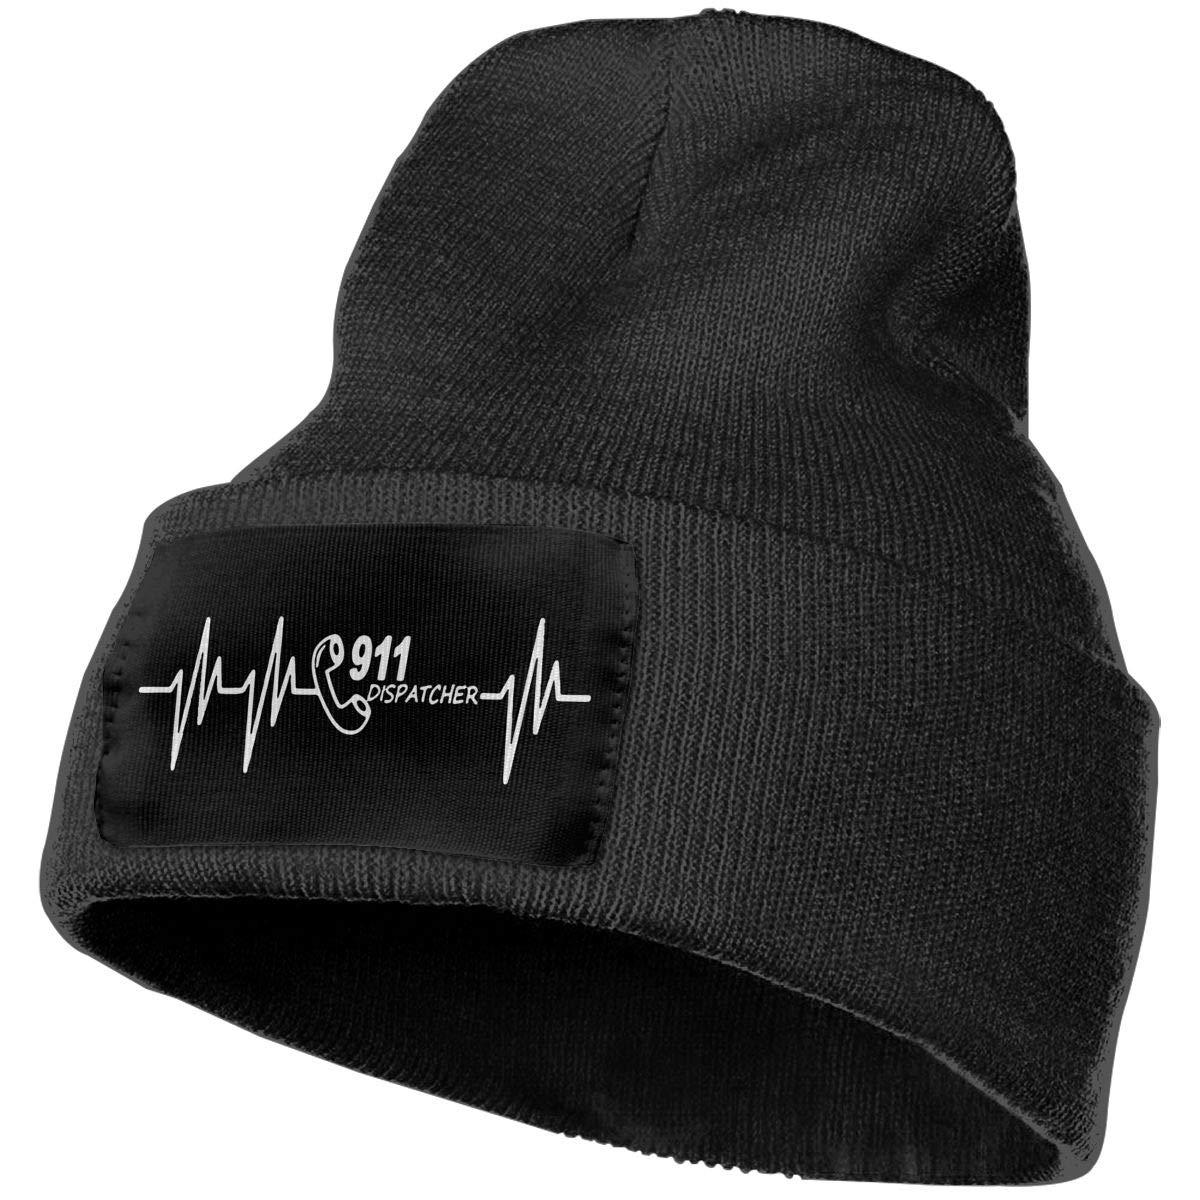 COLLJL-8 Men//Women Dispatcher 911 Outdoor Warm Knit Beanies Hat Soft Winter Knit Caps